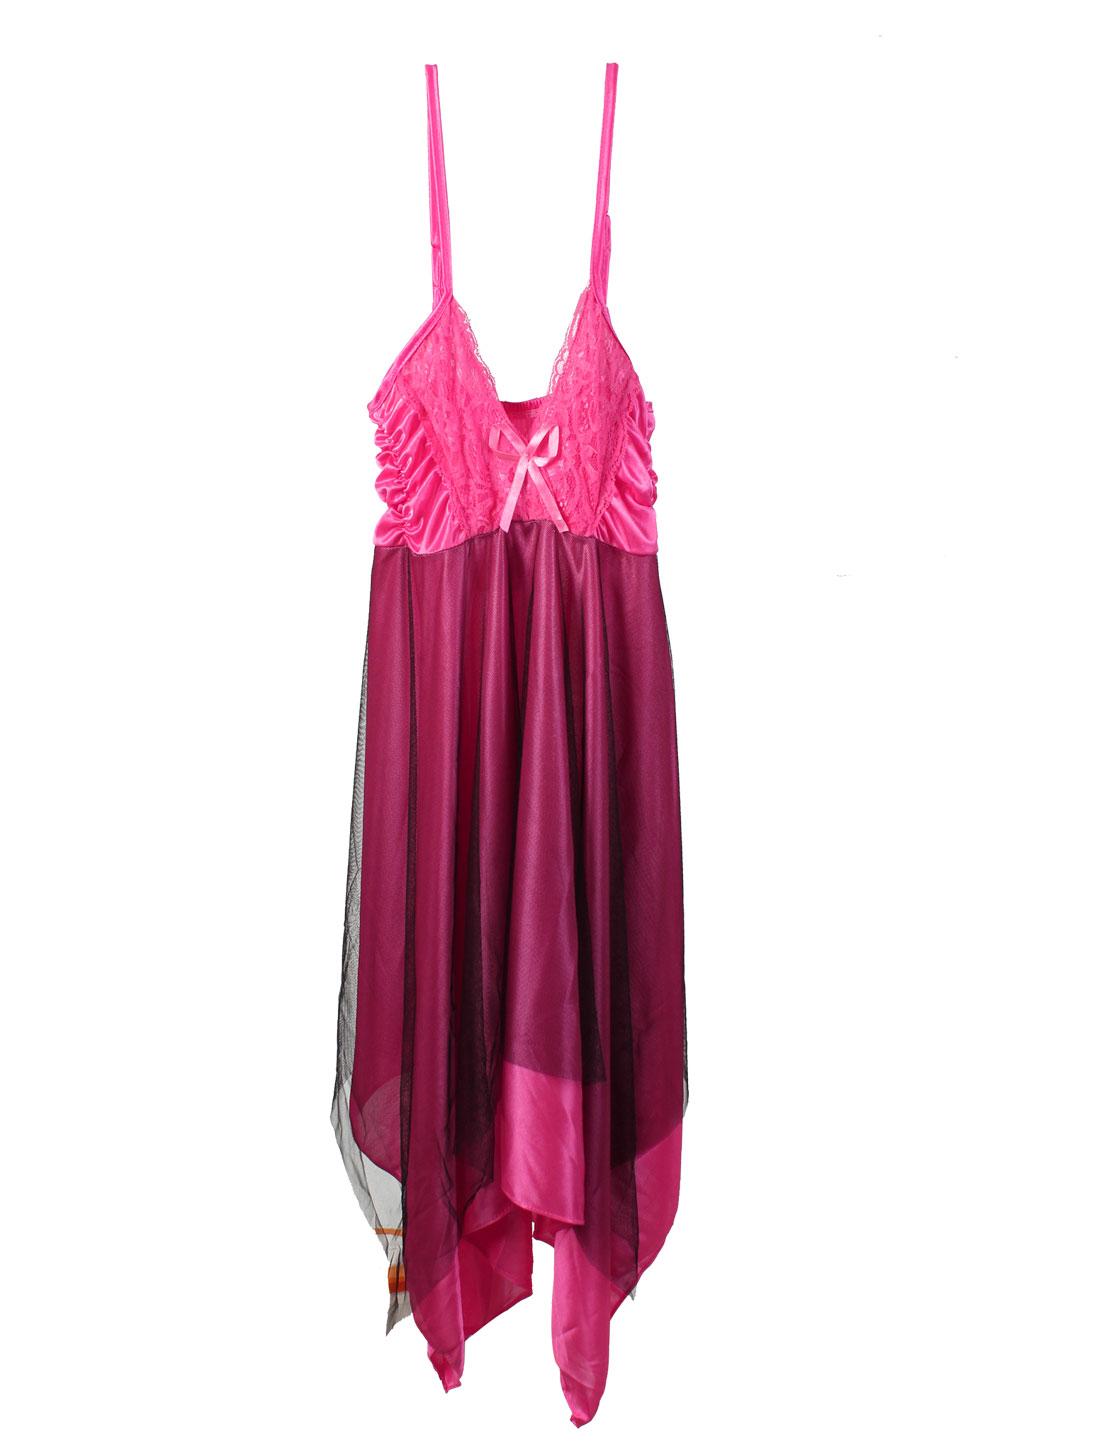 Women Lace Decor Sexy Lingerie Babydoll Night Sleepwear Dress Fuchsia XS